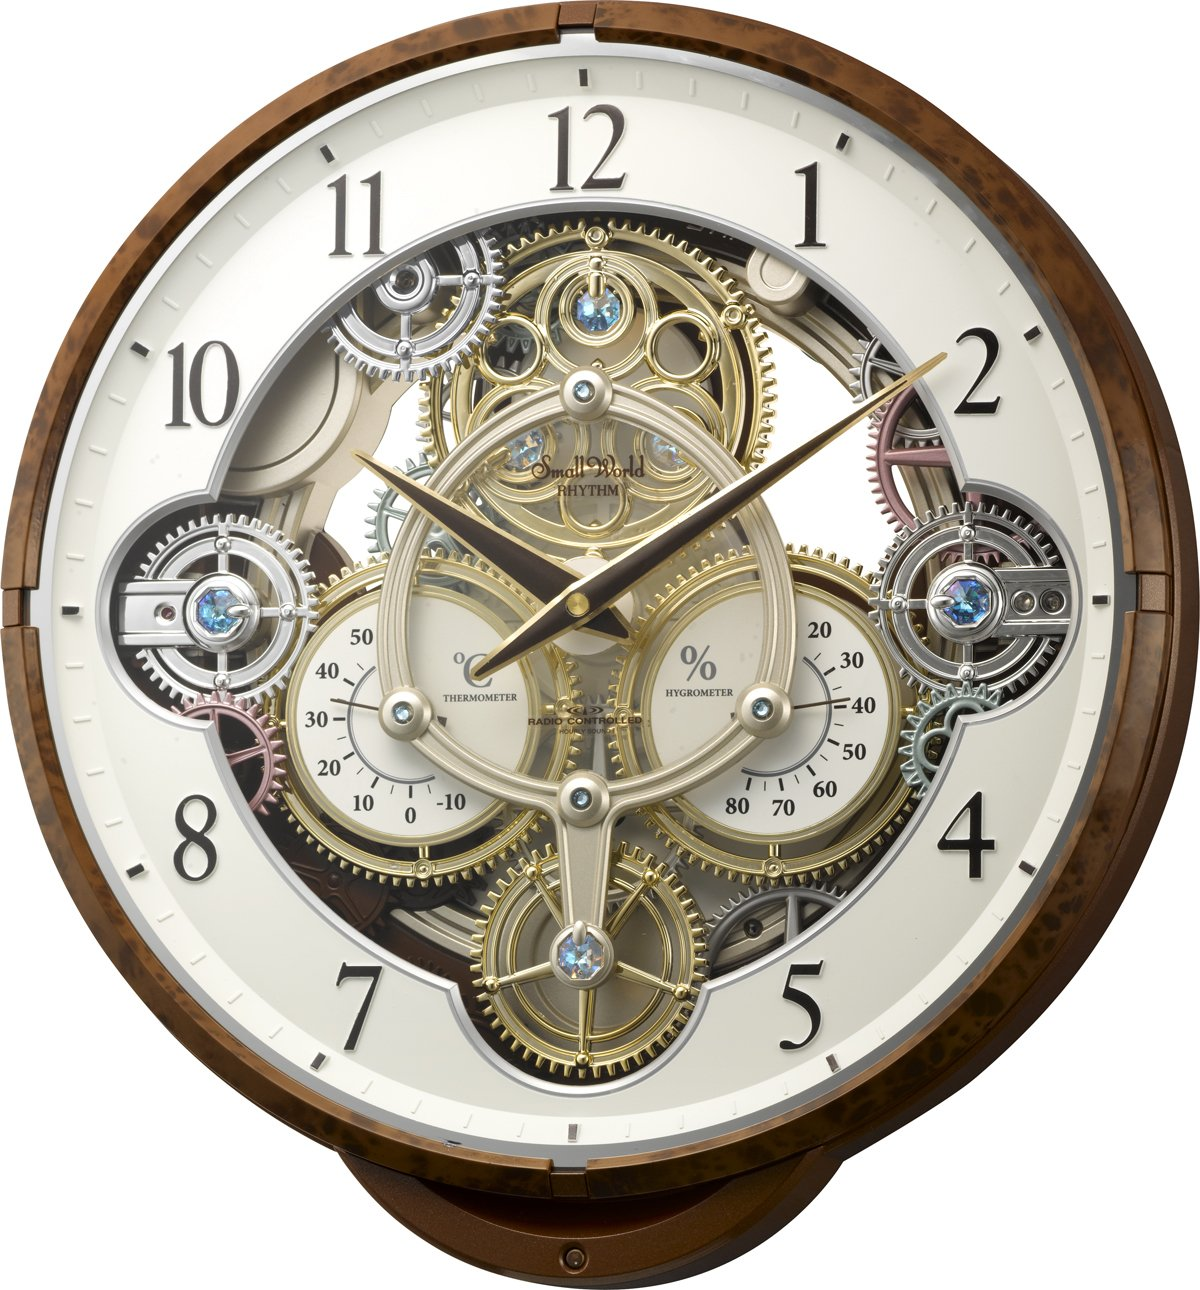 Small World(リズム時計) 機械式時計をイメージした《ギアからくり時計》 プラスチック枠/木目調仕上げ 4MN515RH23 B00M2C4J10